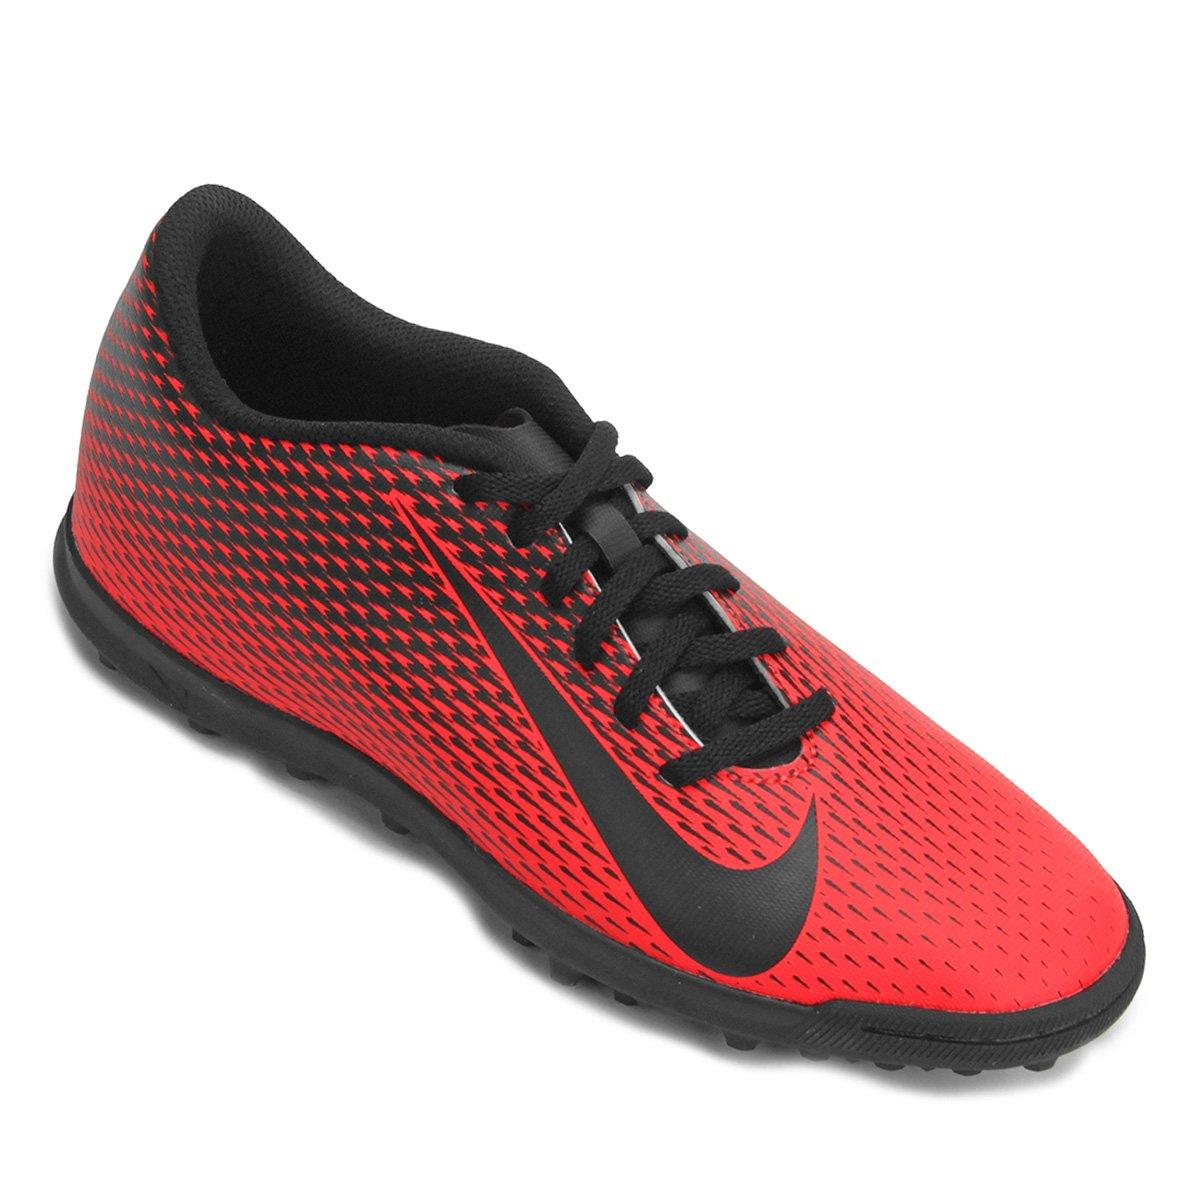 5107fc8247d30 Chuteira Society Nike Bravata 2 TF - Vermelho e Preto - Compre Agora ...